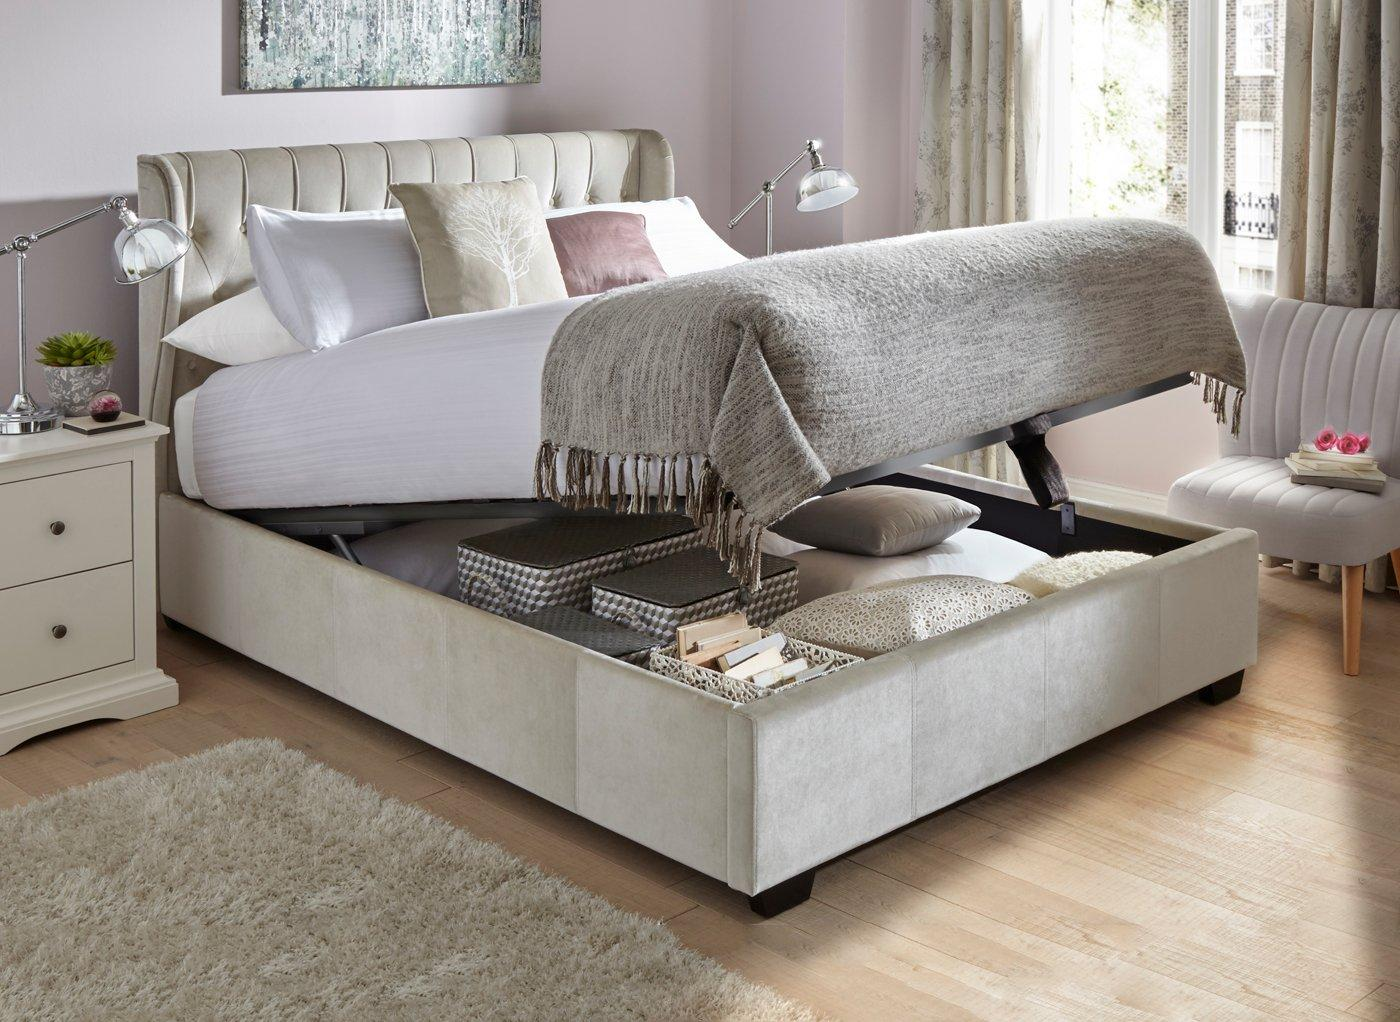 sana-fabric-upholstered-ottoman-bed-frame